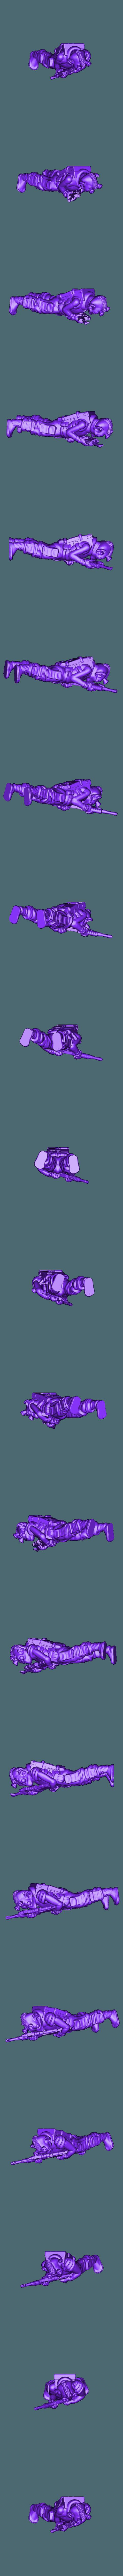 RodianTrooperFDM.stl Download free STL file Rodian Rebel Trooper (FDM optimized, 28mm/Heroic scale) • 3D printable design, Dutchmogul